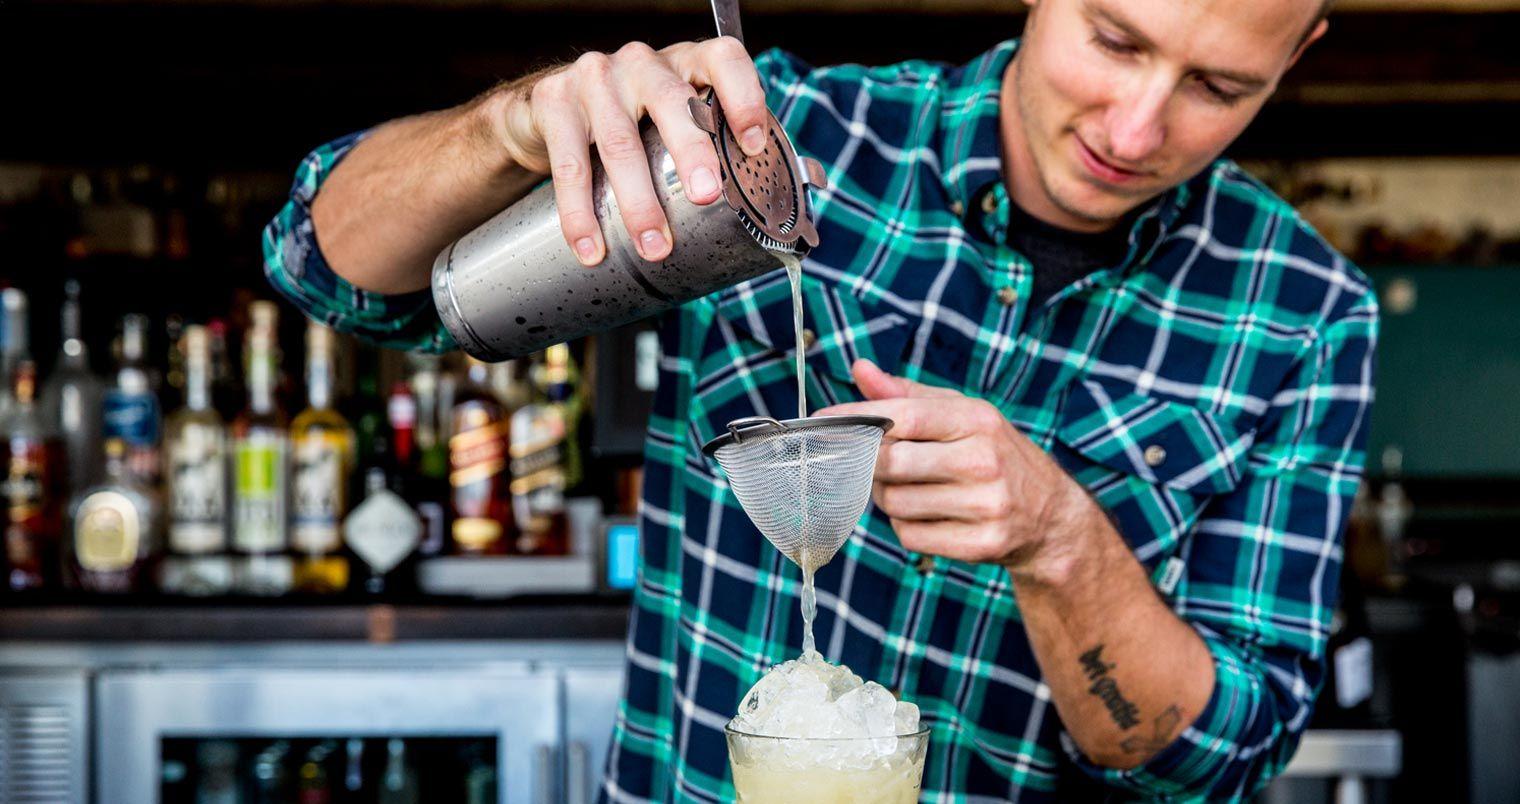 Spotlight on Falernum Cool bars, Brandy old fashioned